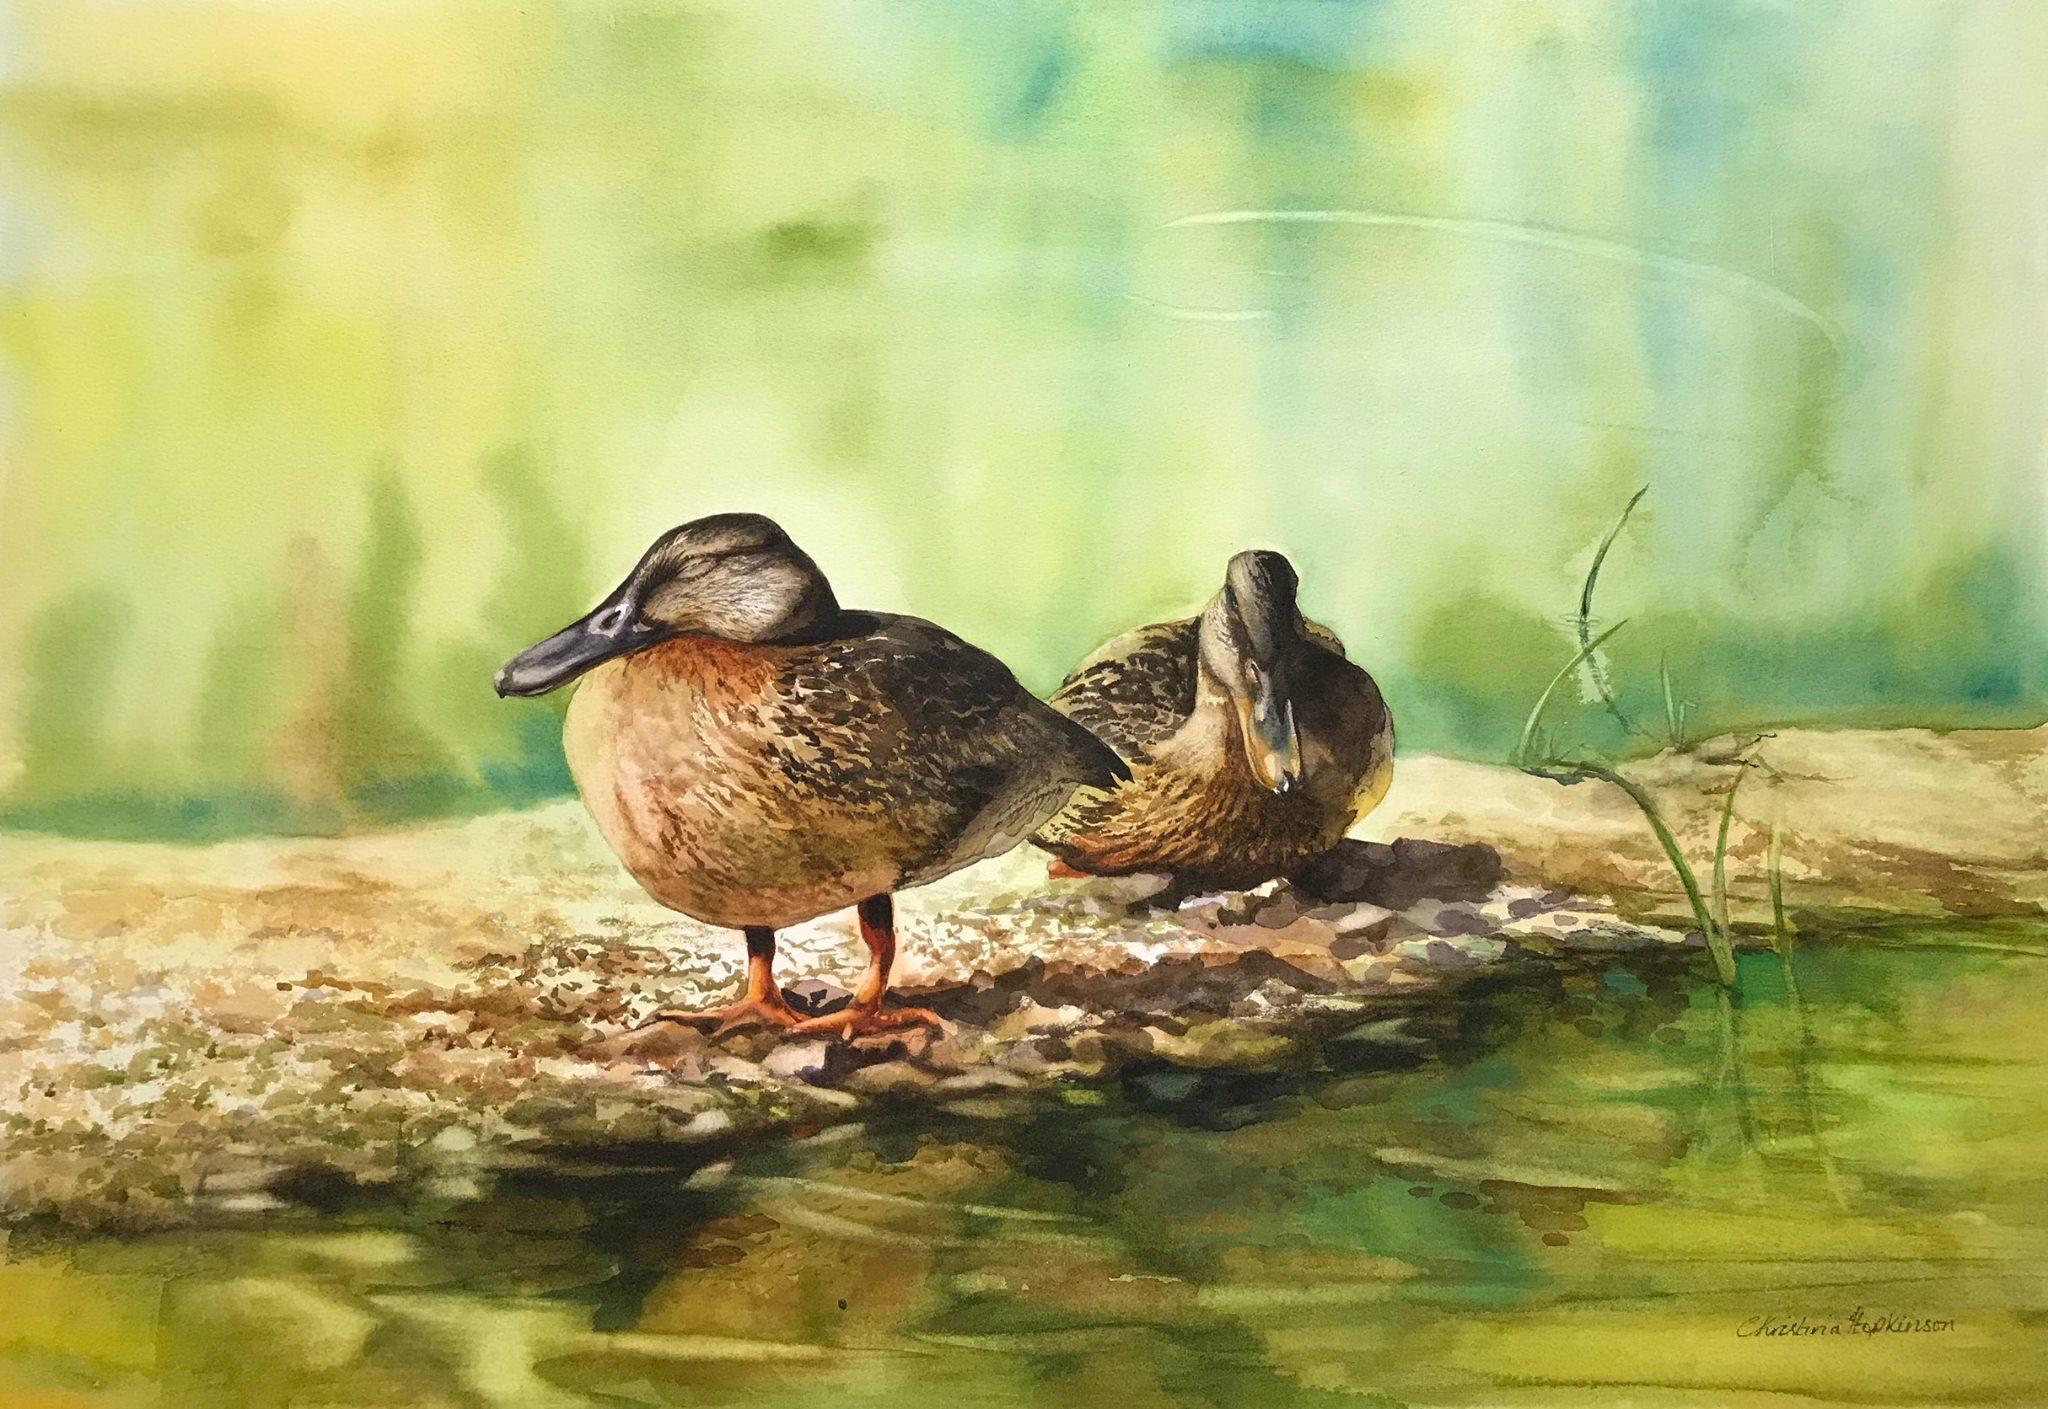 Christina Hopkinson, Golden Slumbers, watercolour on Bockingford CP watercolour board, 15 x 22